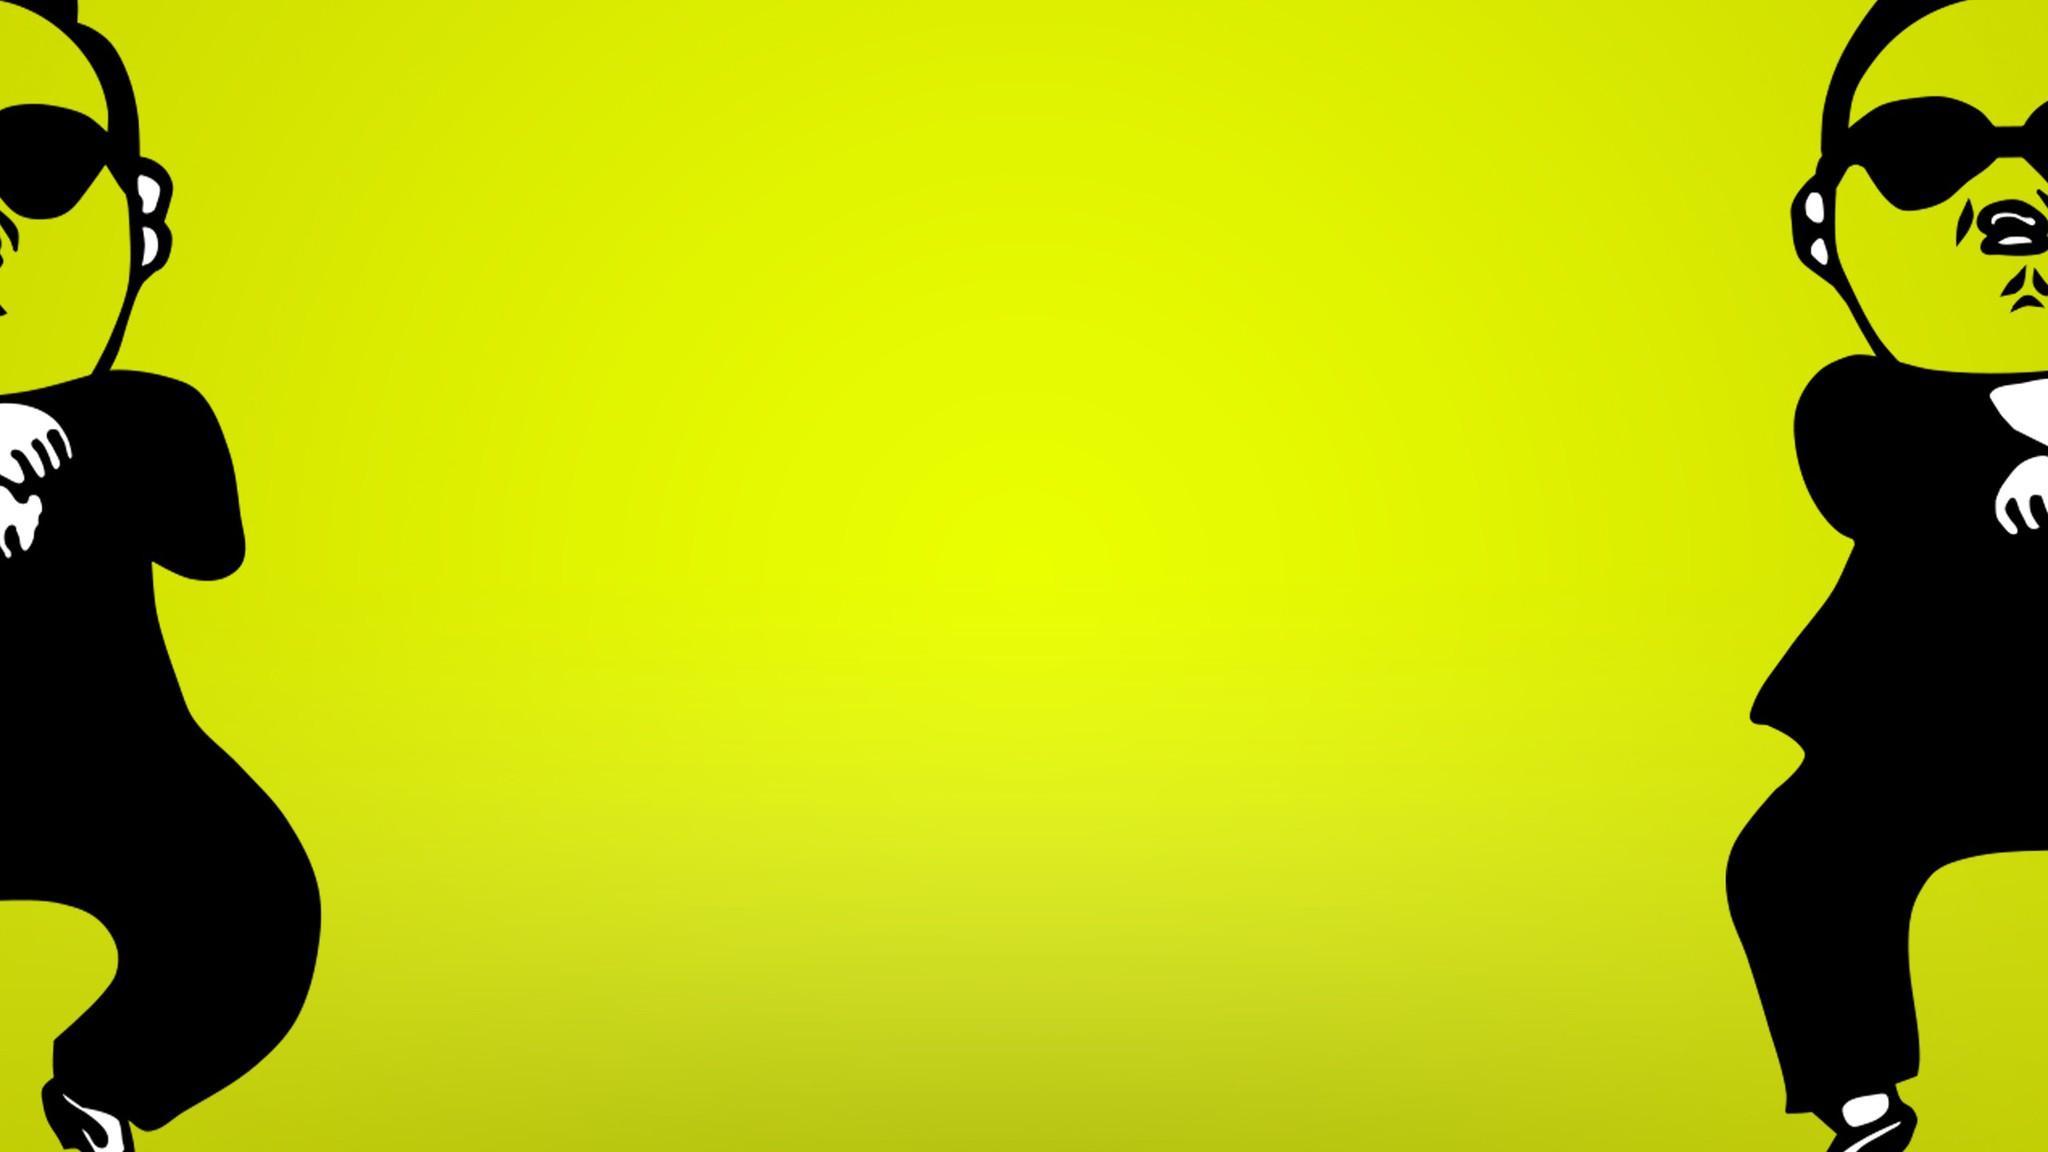 Крутые картинки размером 2048 1152